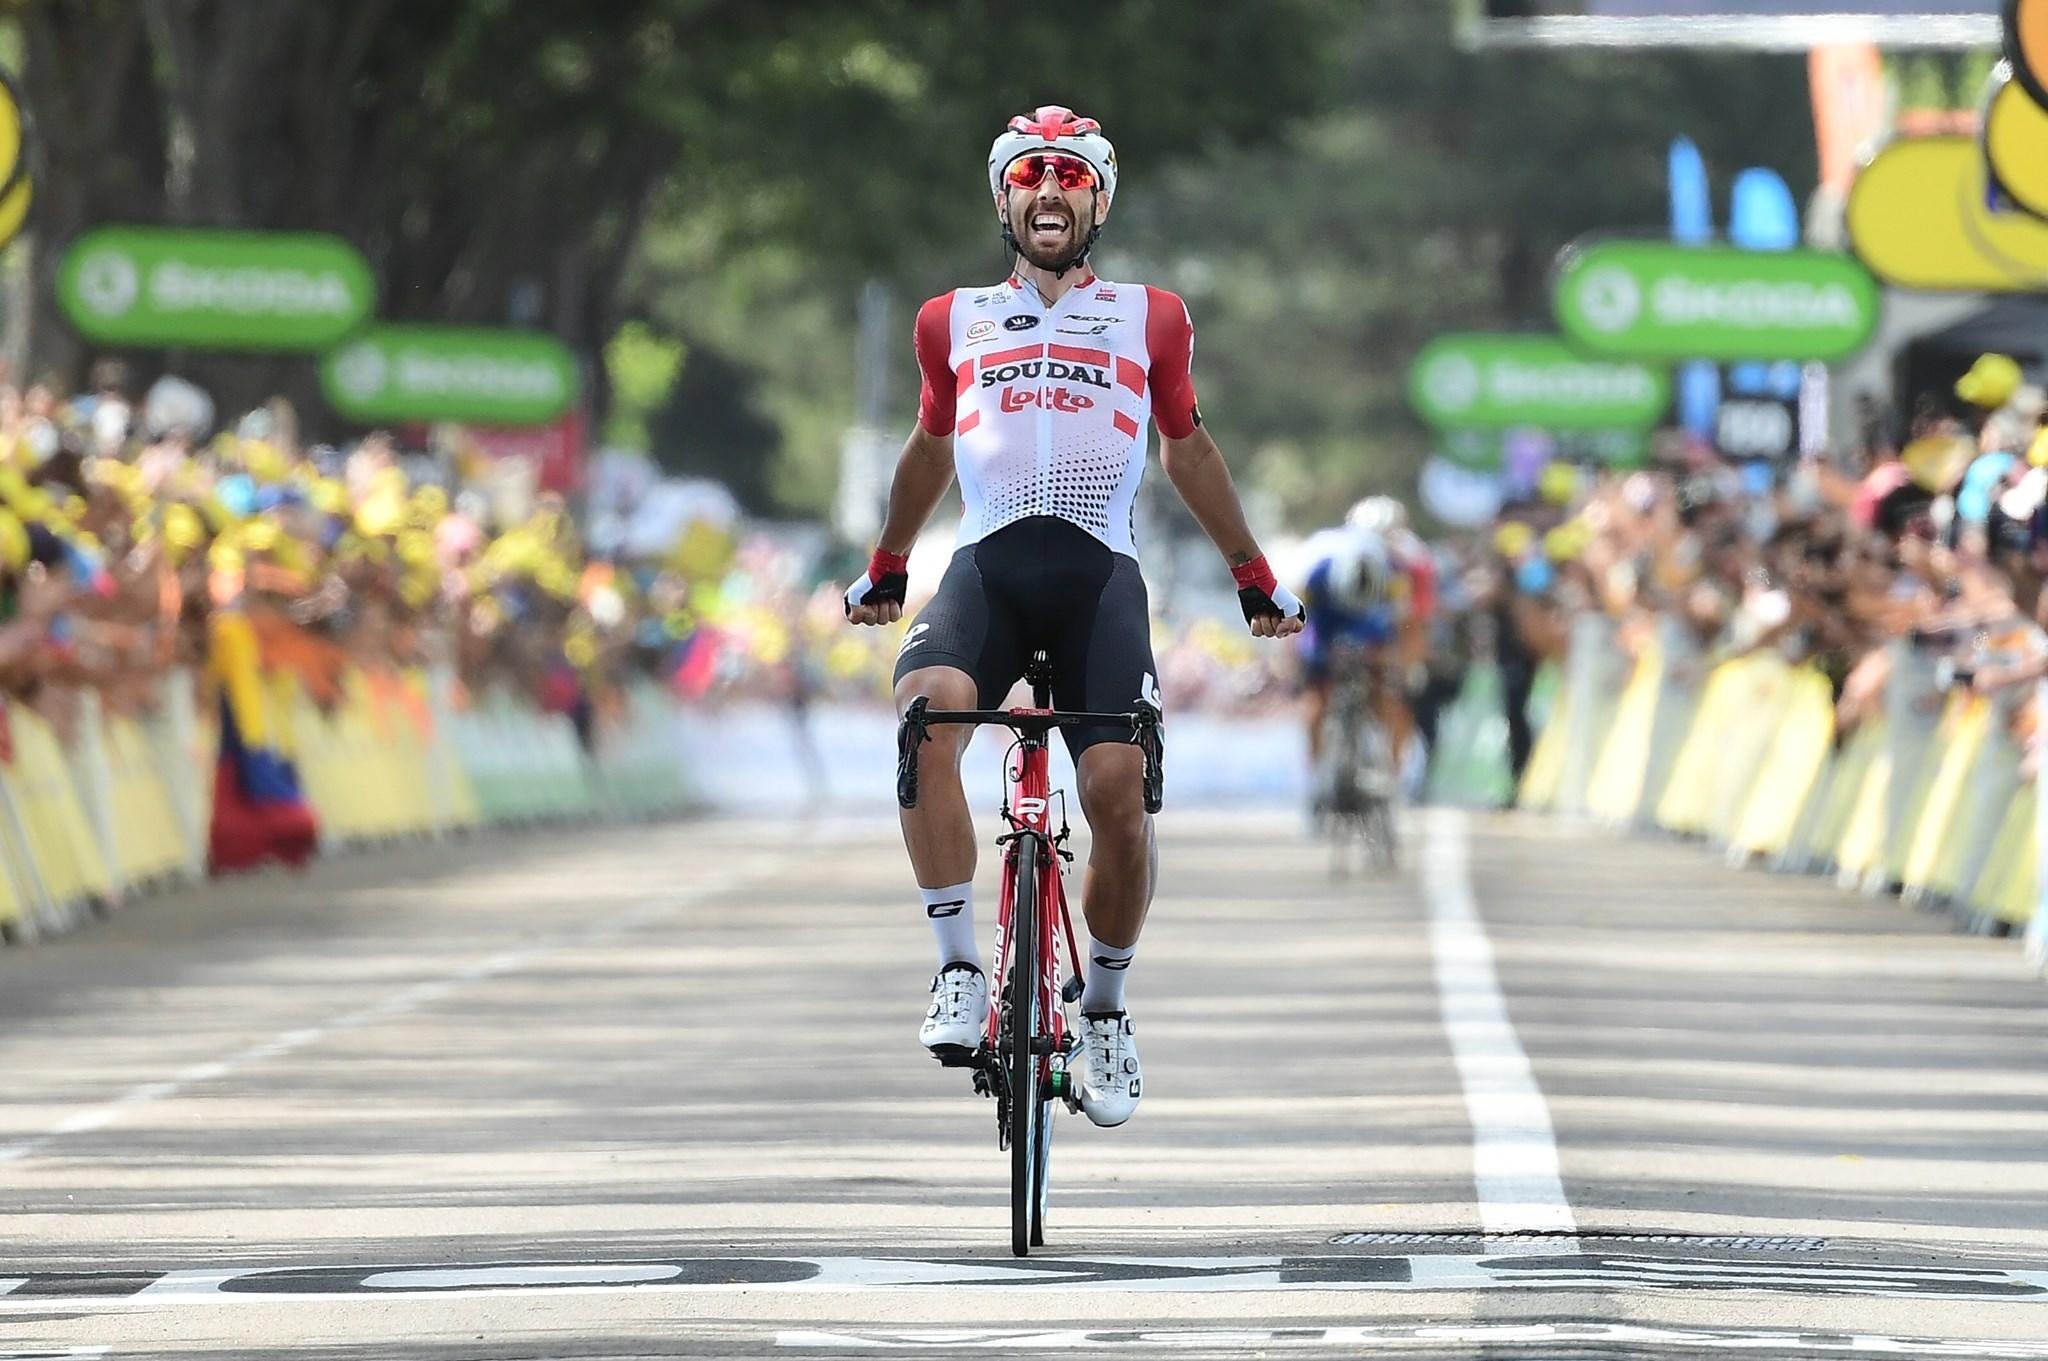 Impresa di Thomas De Gendt nell'ottava tappa del Tour de France ...